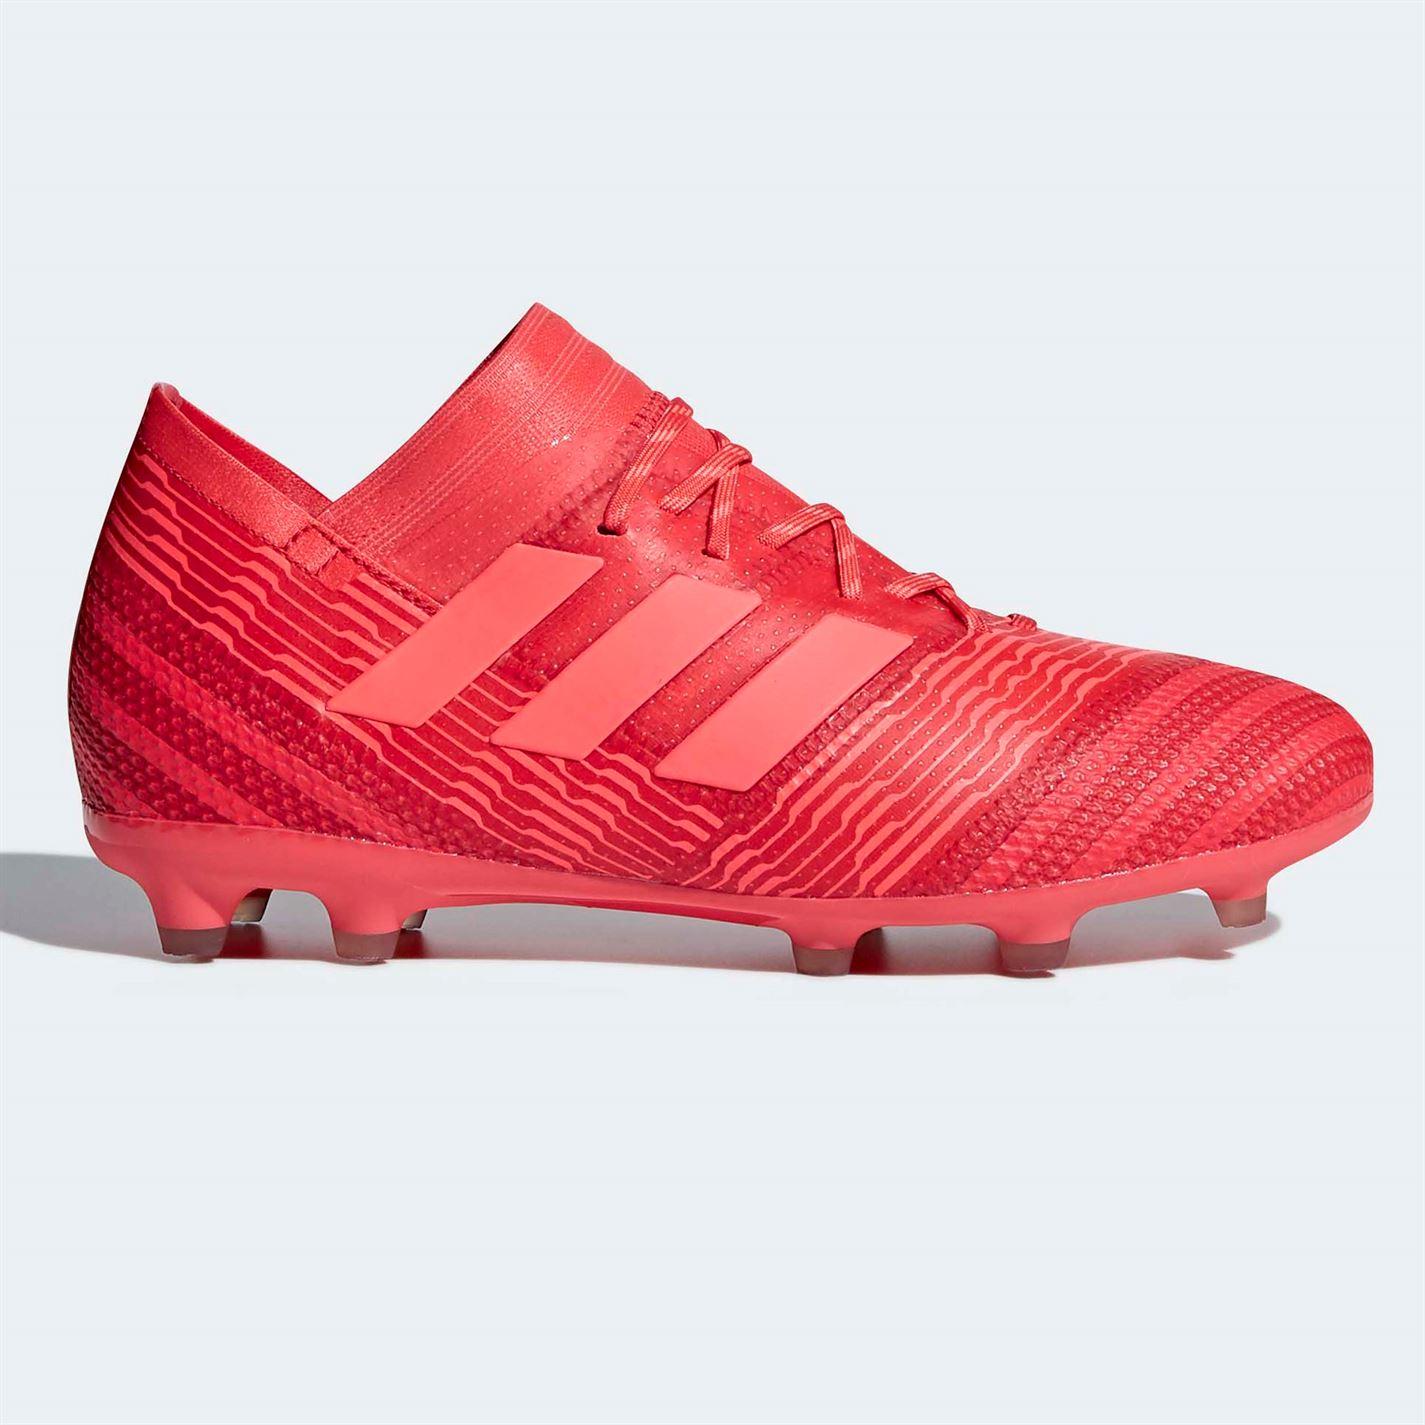 adidas Nemeziz 17.1 Junior FG Football Boots